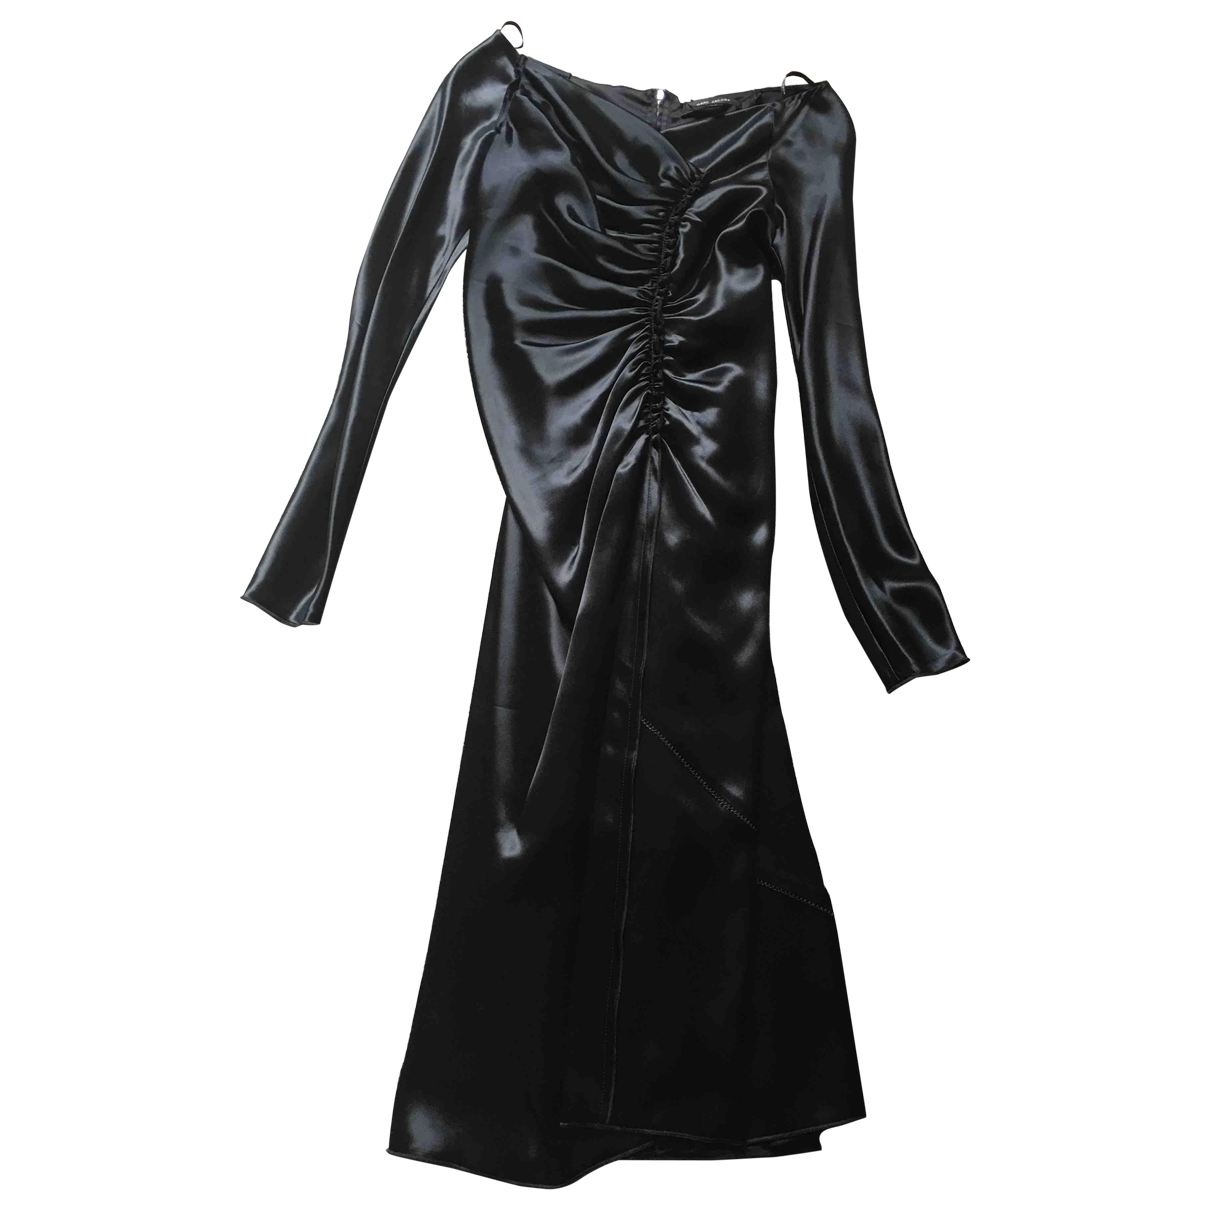 Marc Jacobs \N Black Silk dress for Women 4 0-5